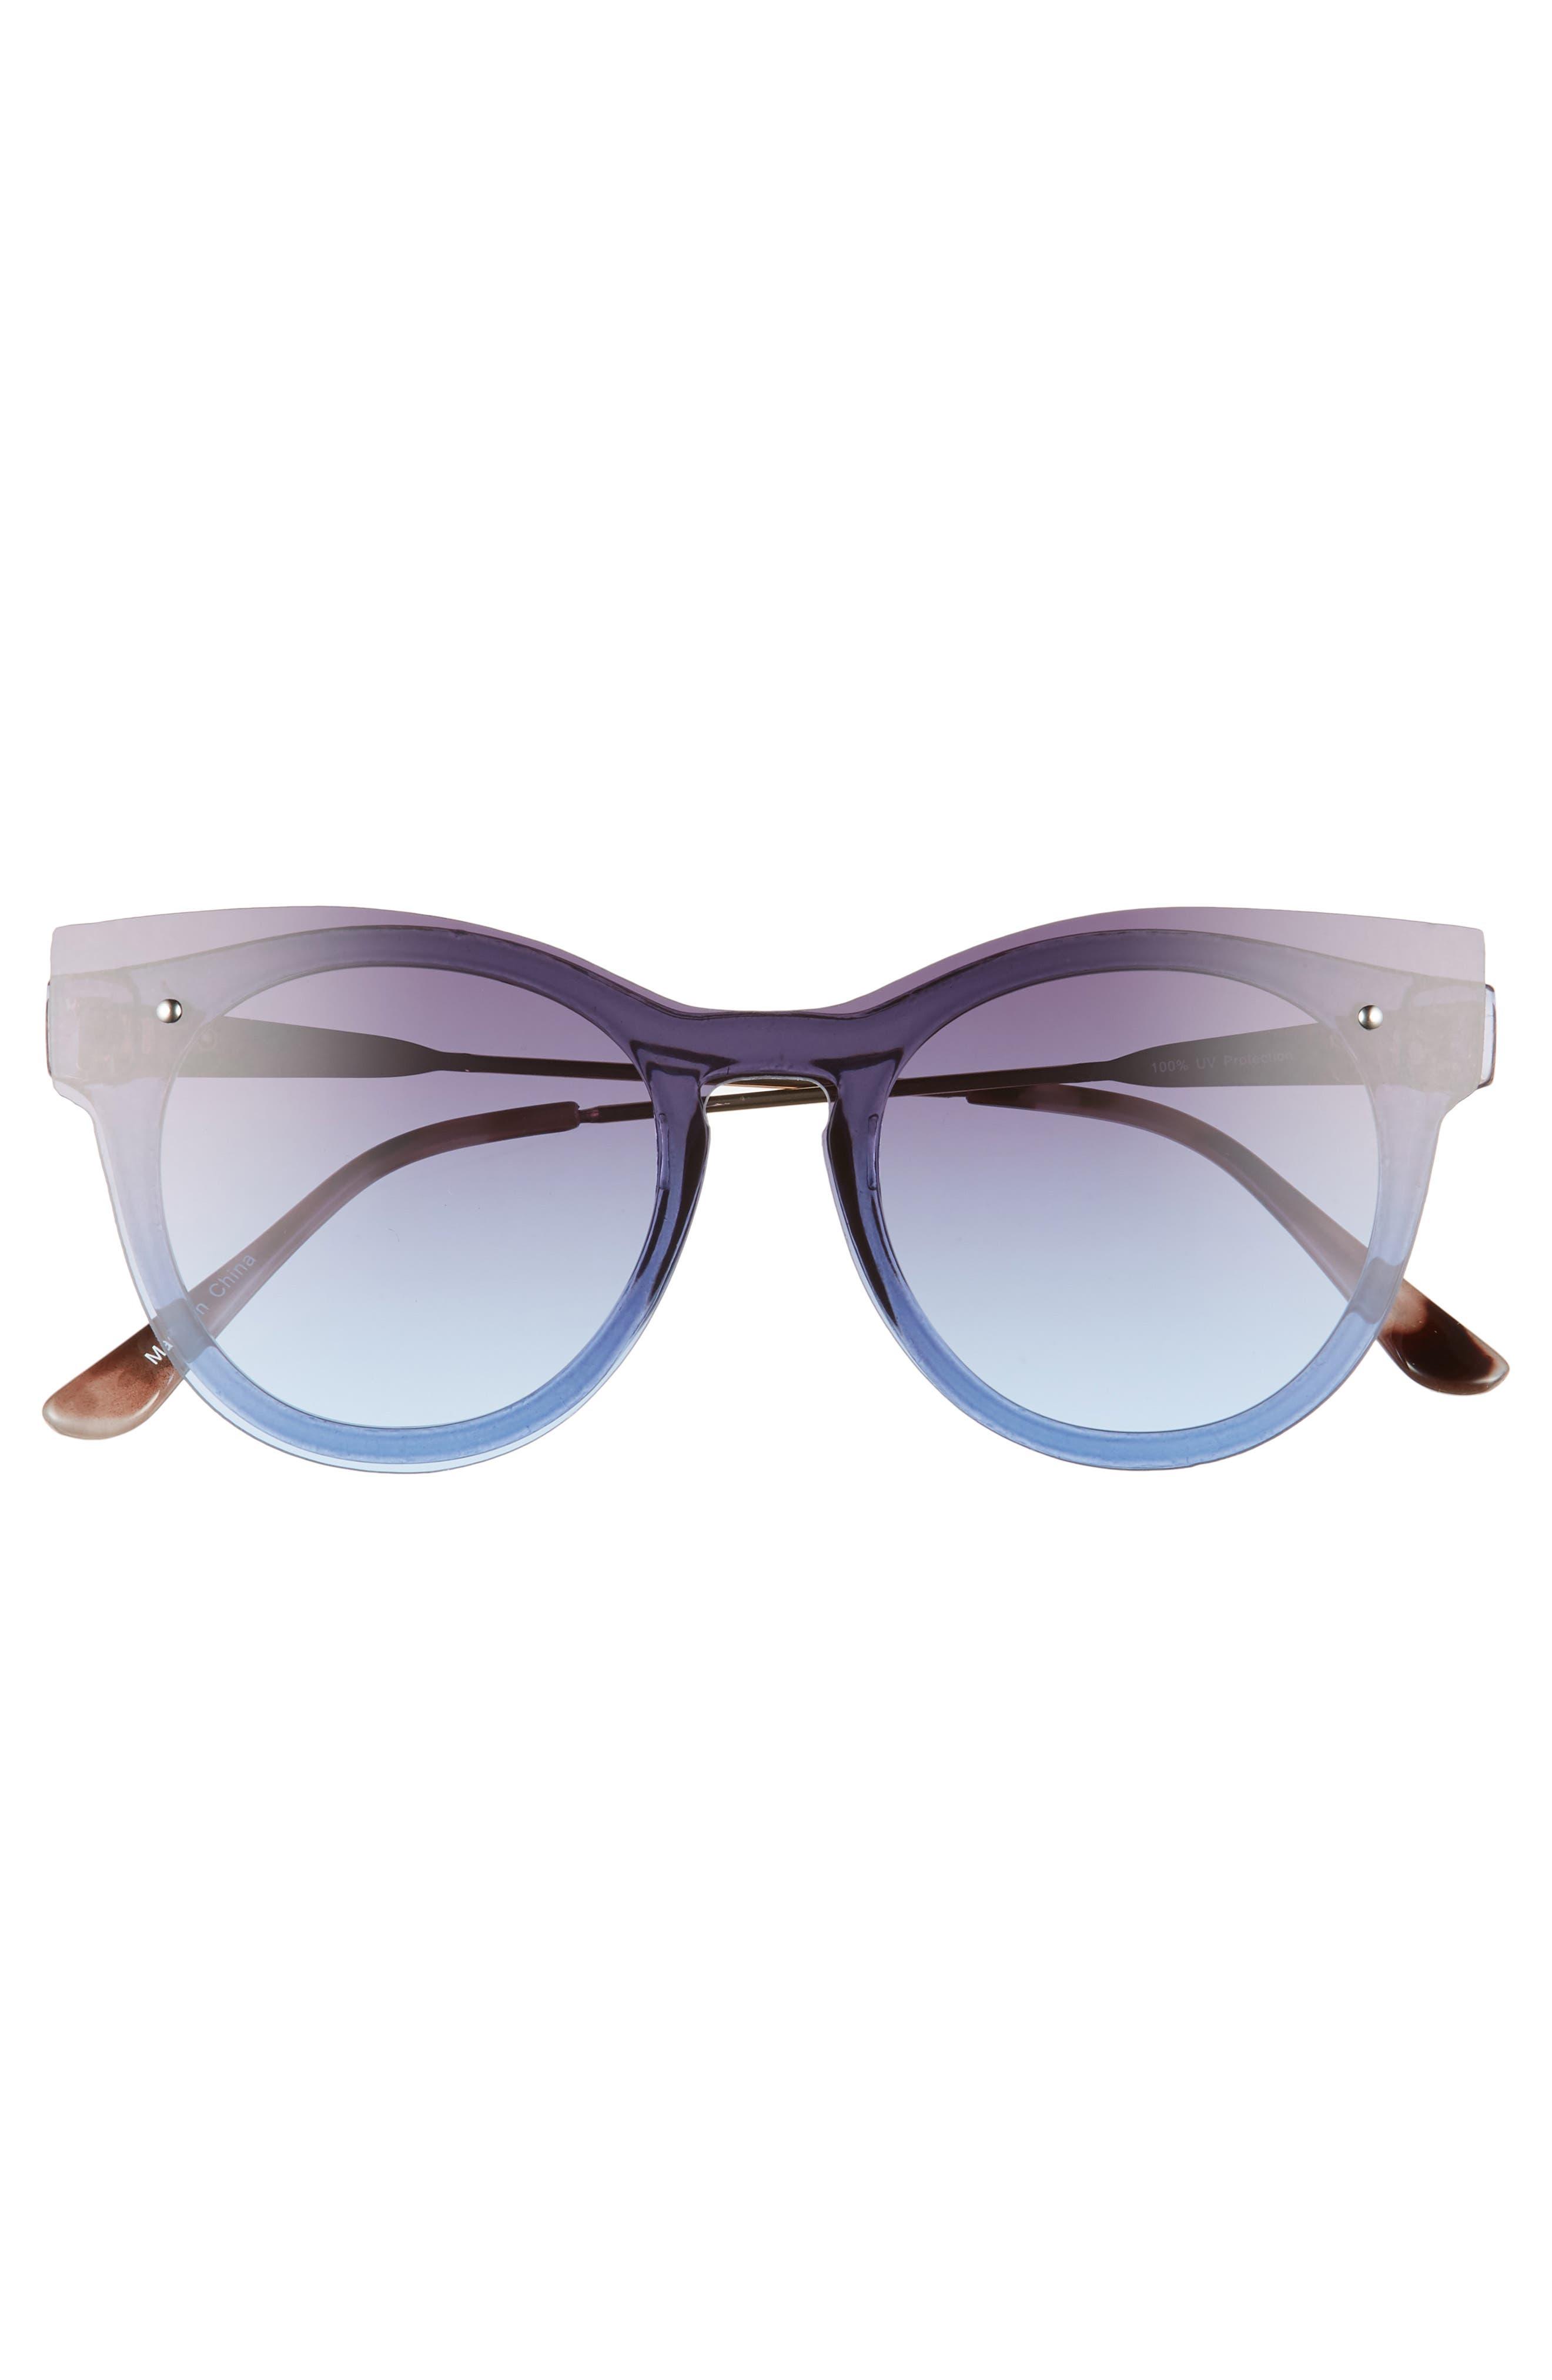 51mm Flat Cat Eye Sunglasses,                             Alternate thumbnail 3, color,                             Gold/ Blue